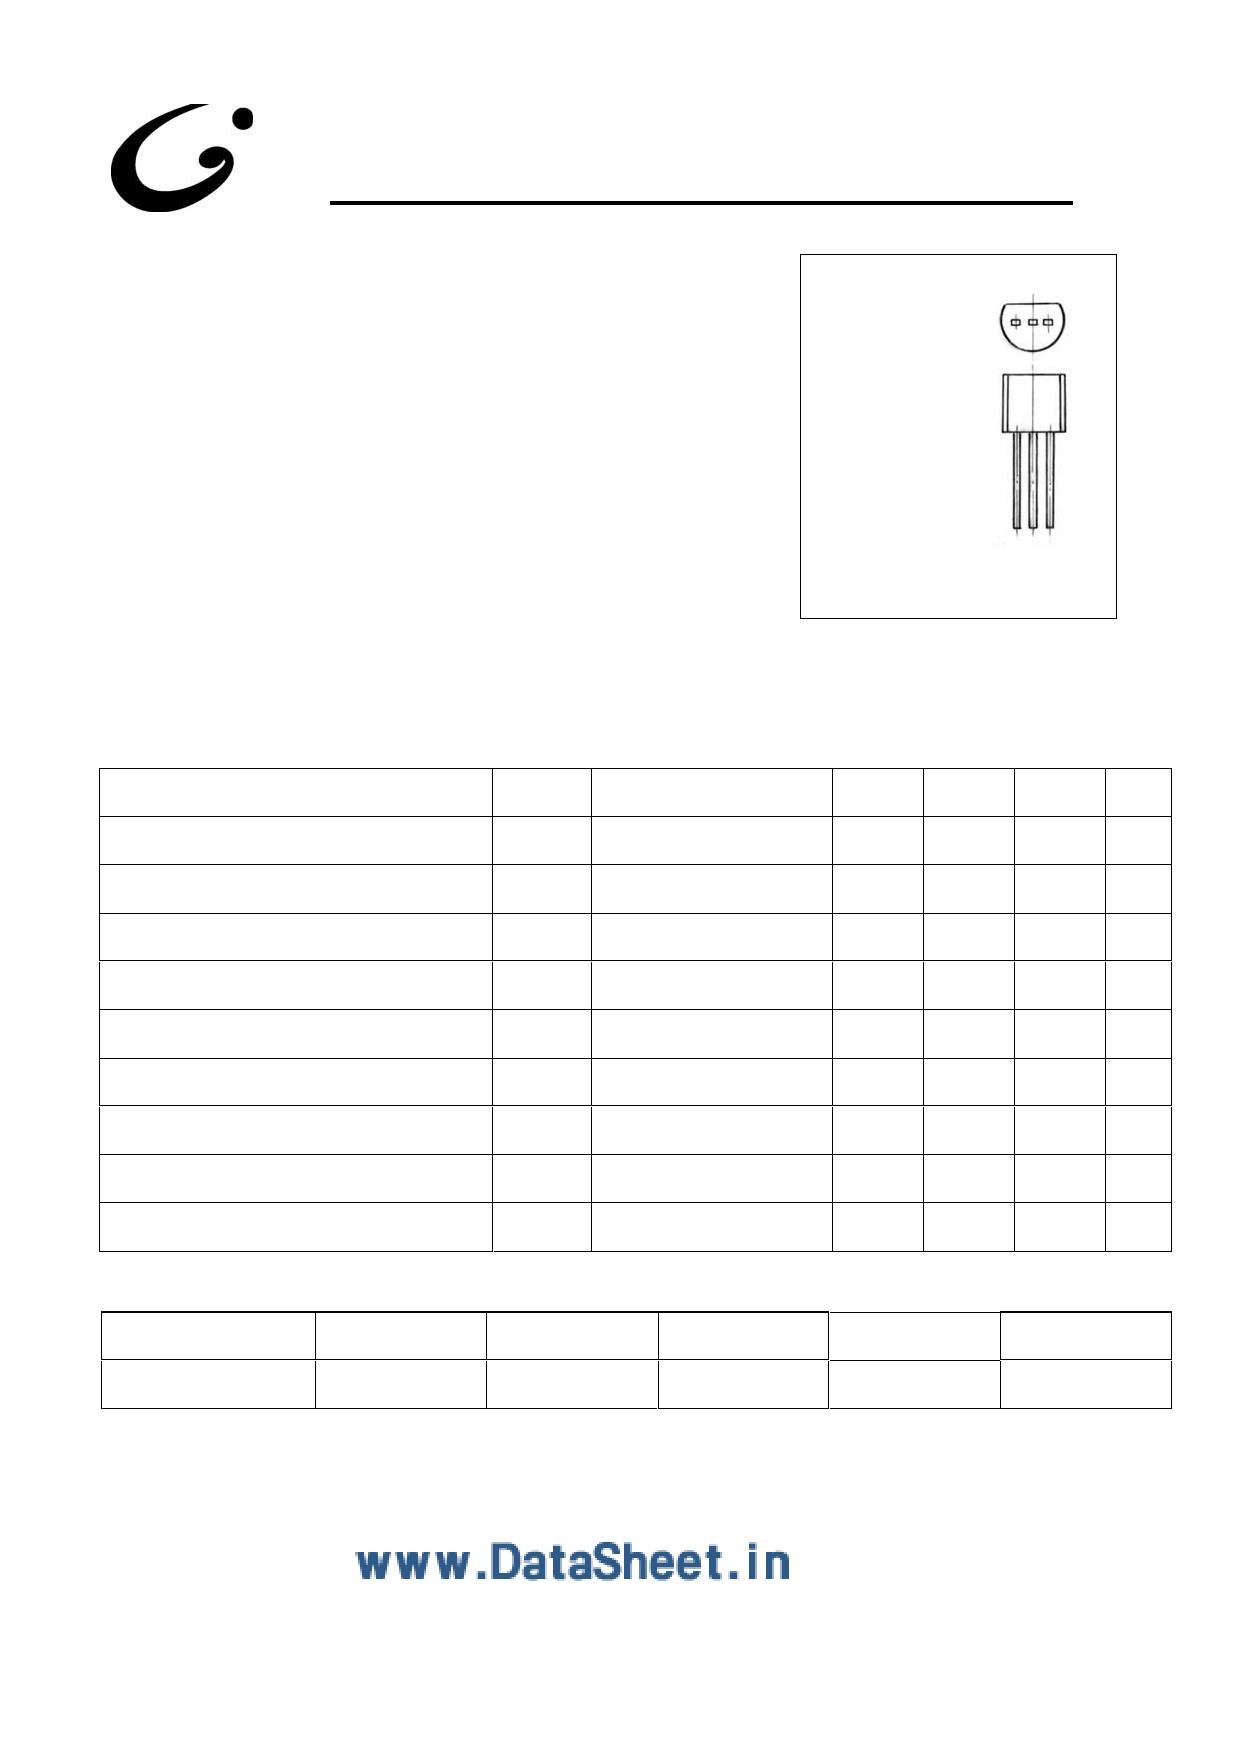 2SC536 Datasheet, 2SC536 PDF,ピン配置, 機能